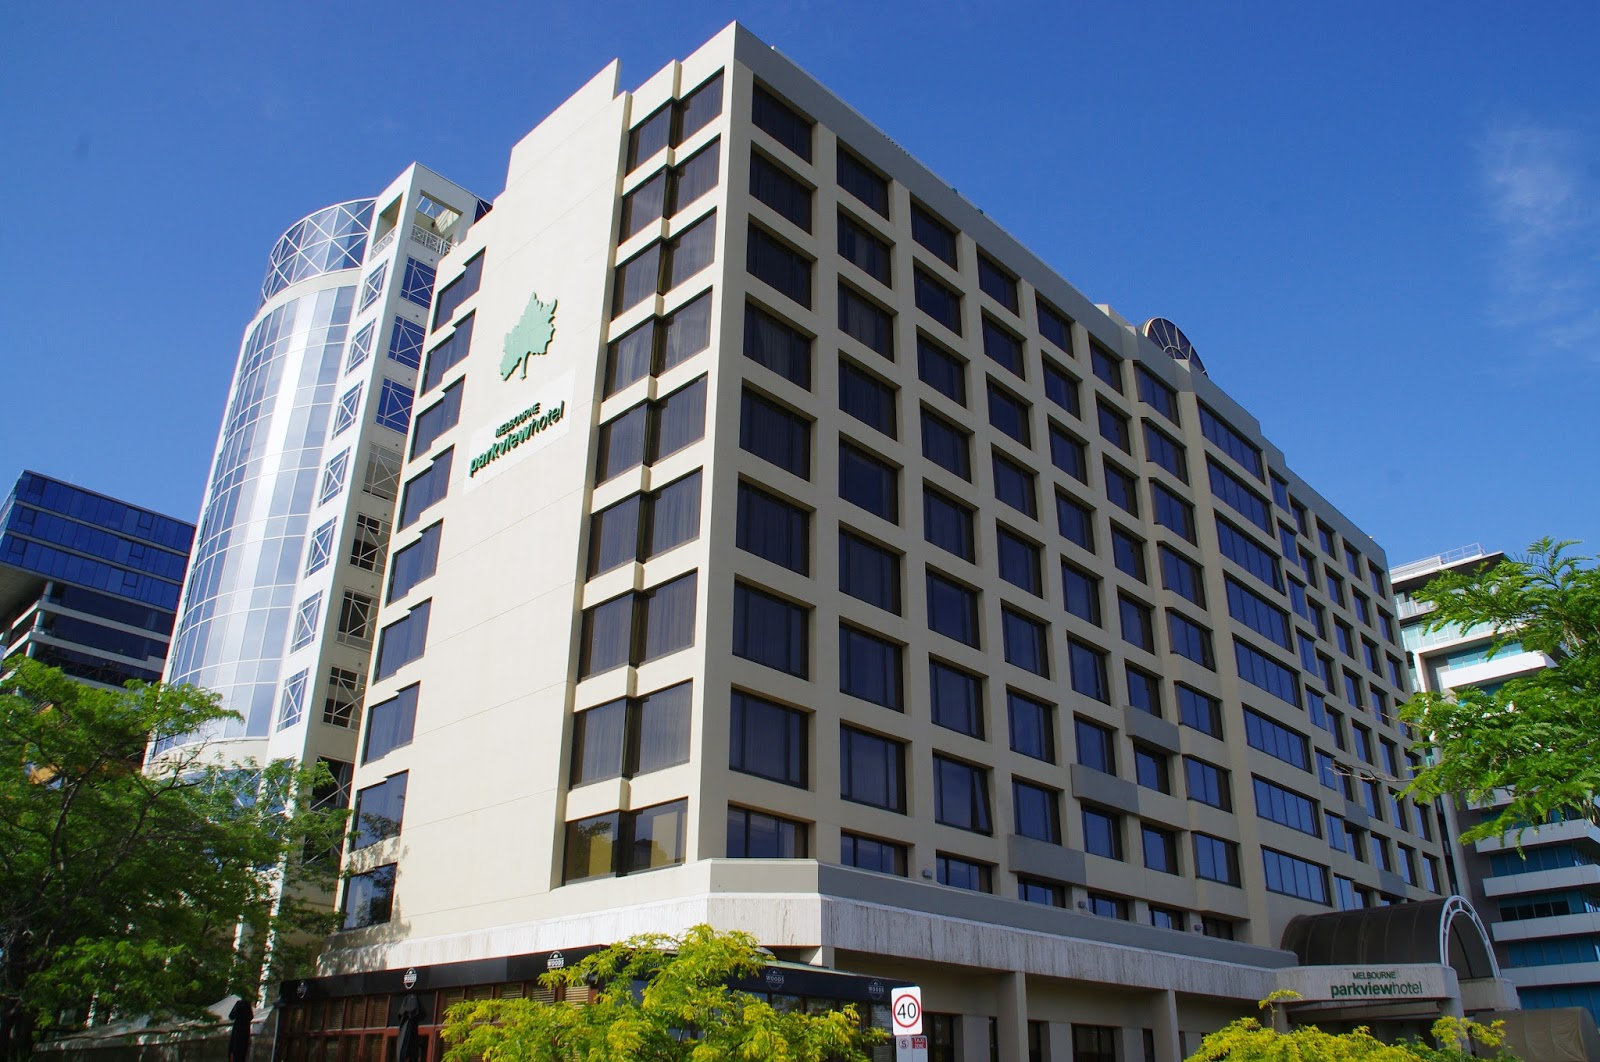 Melbourne Parkview Hotel Exterior